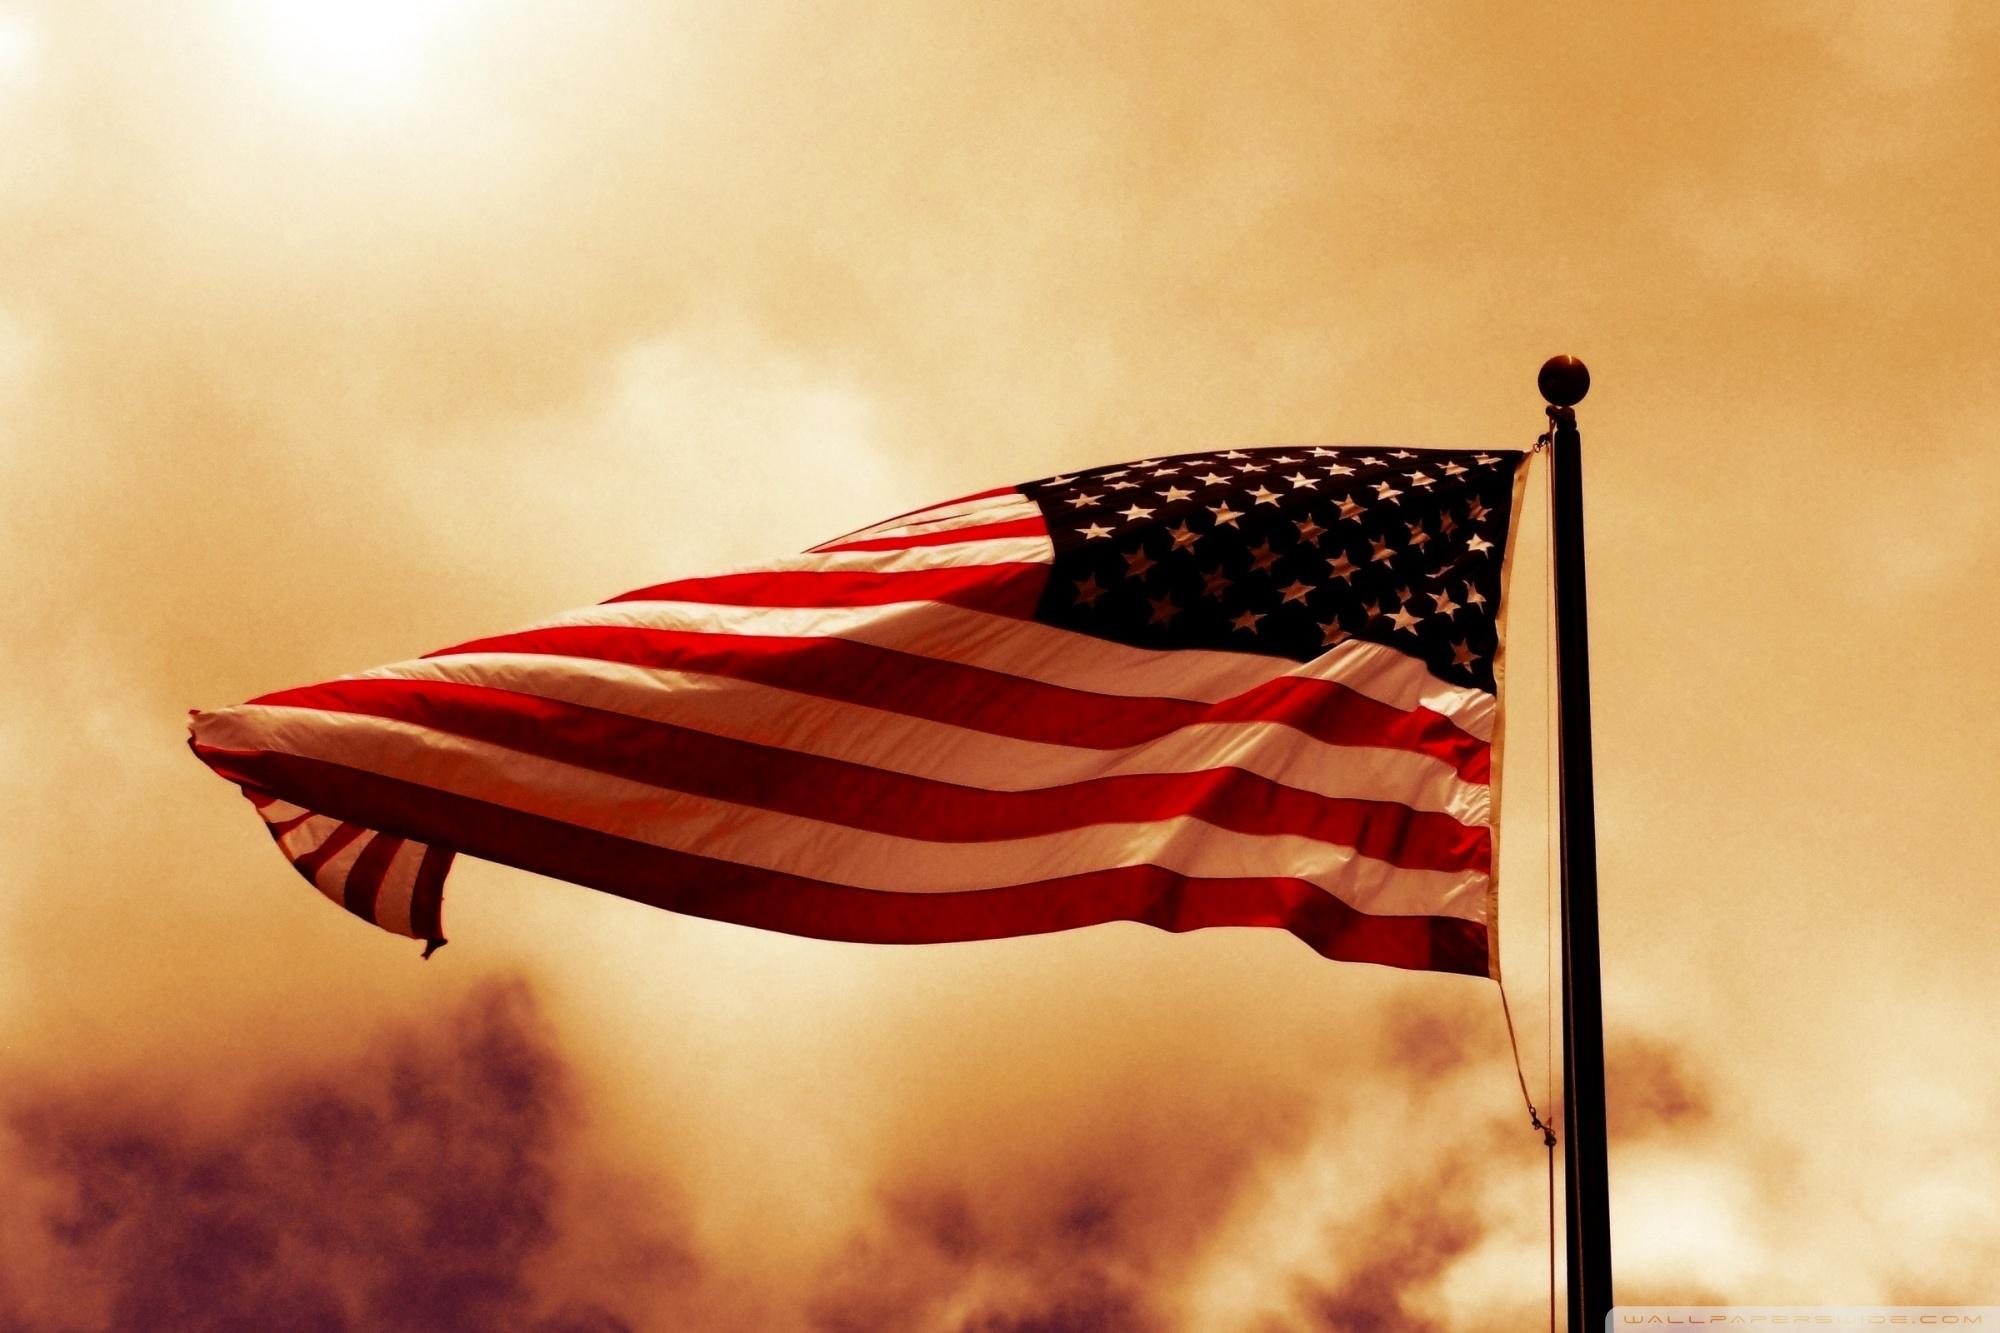 USA Flag 4K HD Desktop Wallpaper for 4K Ultra HD TV Dual 2000x1333